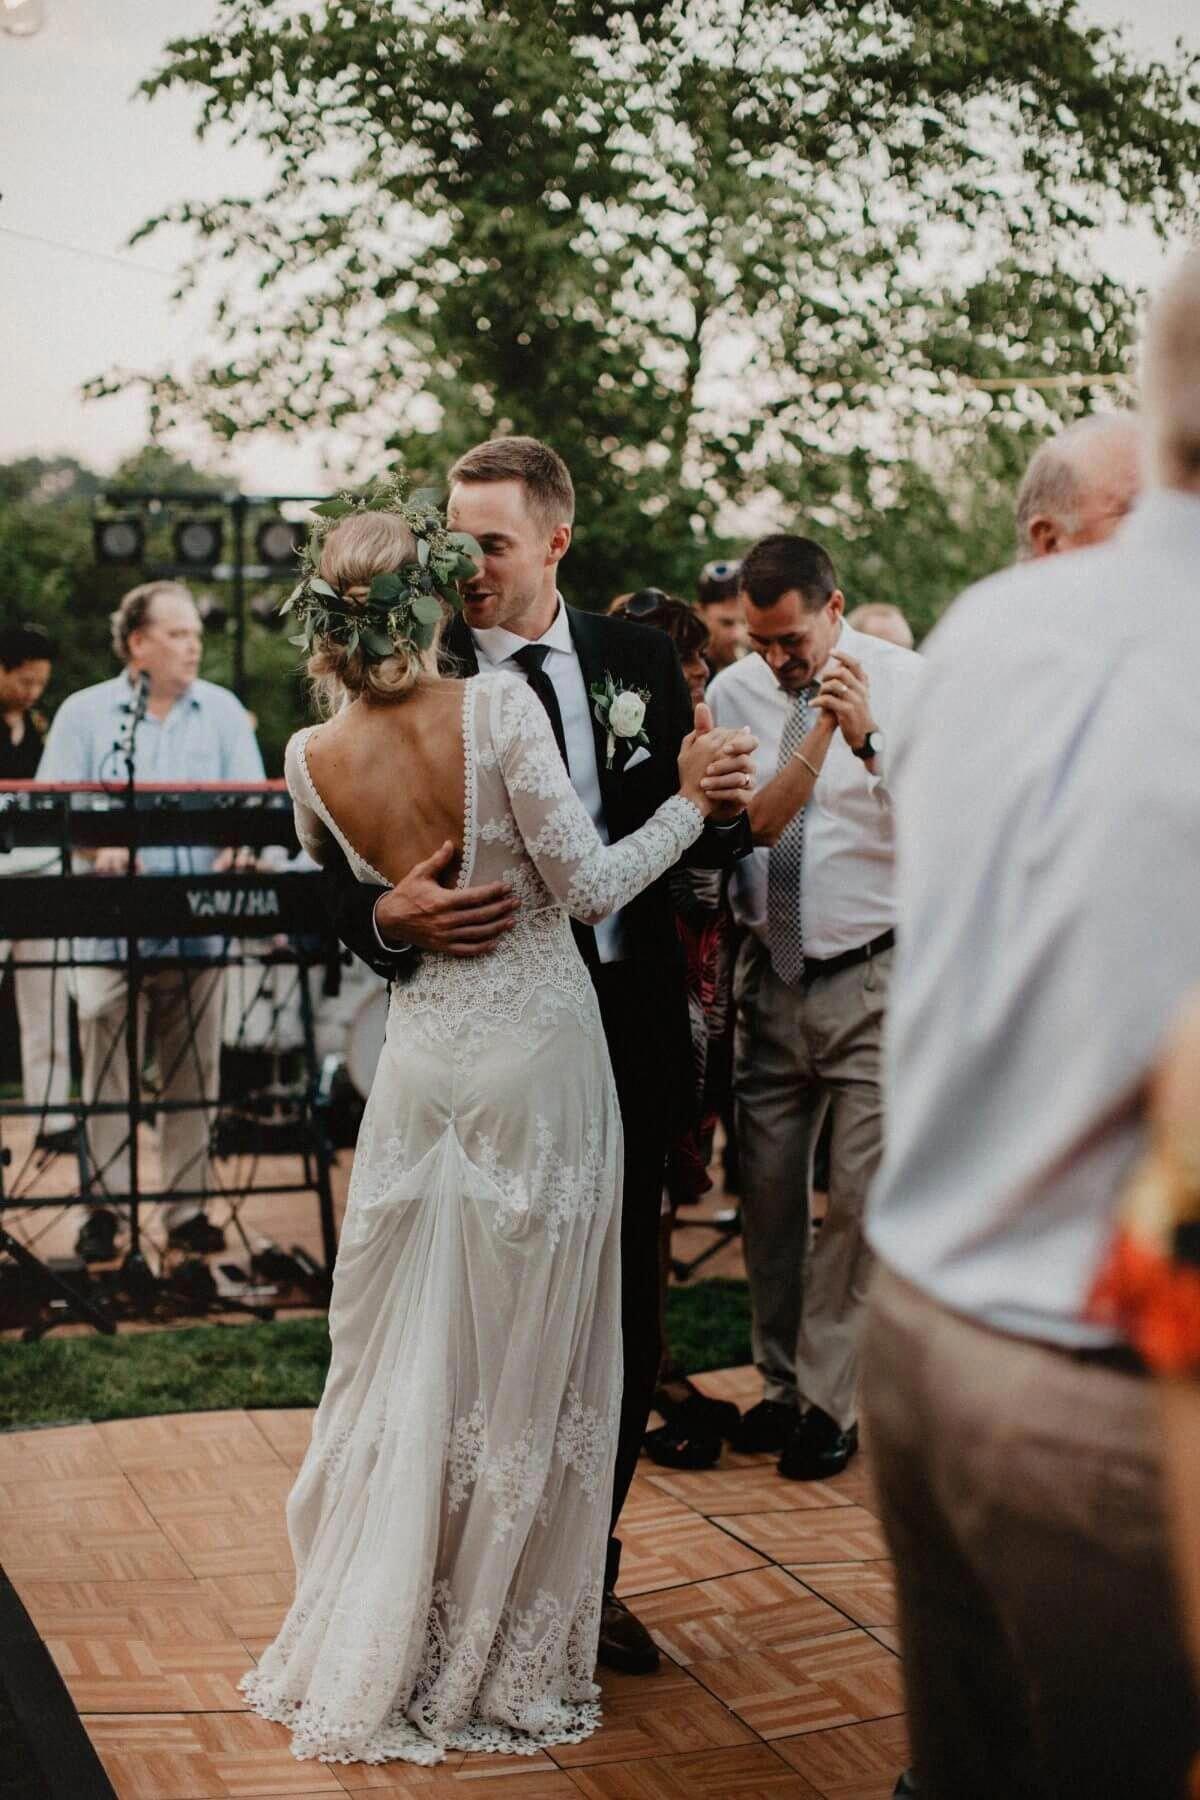 plus size wedding photography #WeddingPhotographyTips #bohowedding #backyardweddingdresscasual